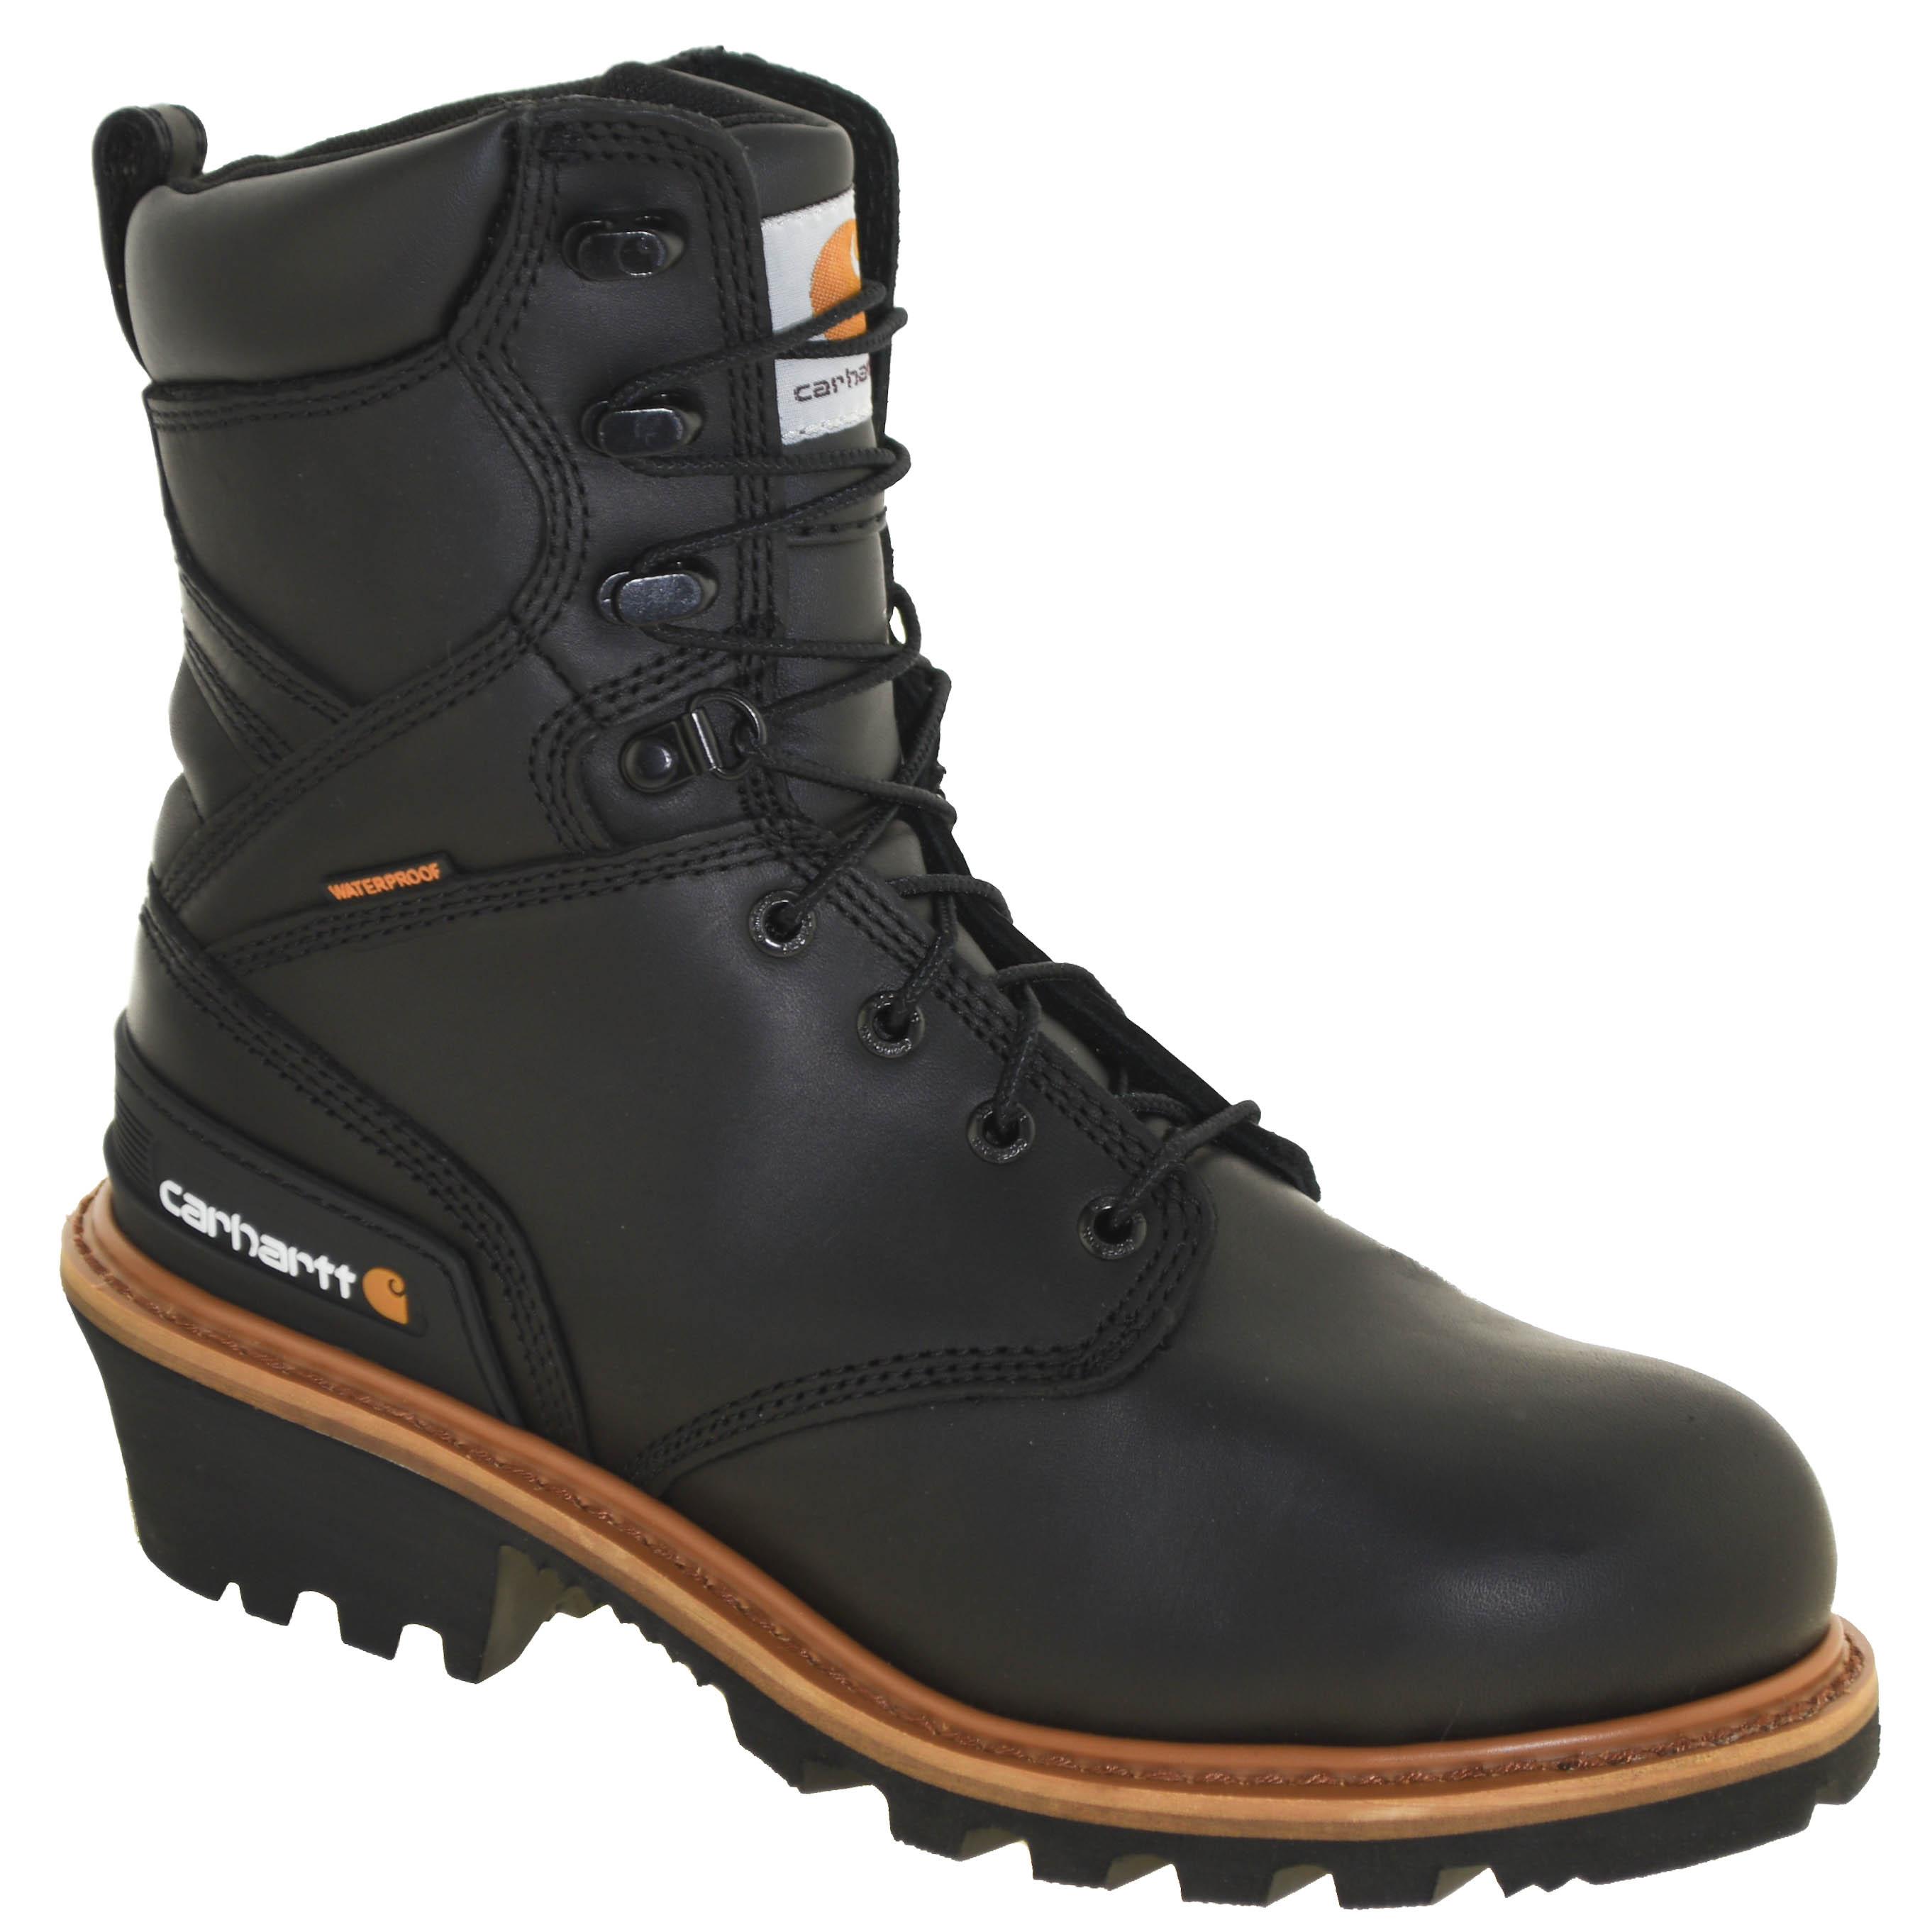 538914fe6f6 Details about Men's Carhartt CML8131 Waterproof Soft Toe Logger Work Boots